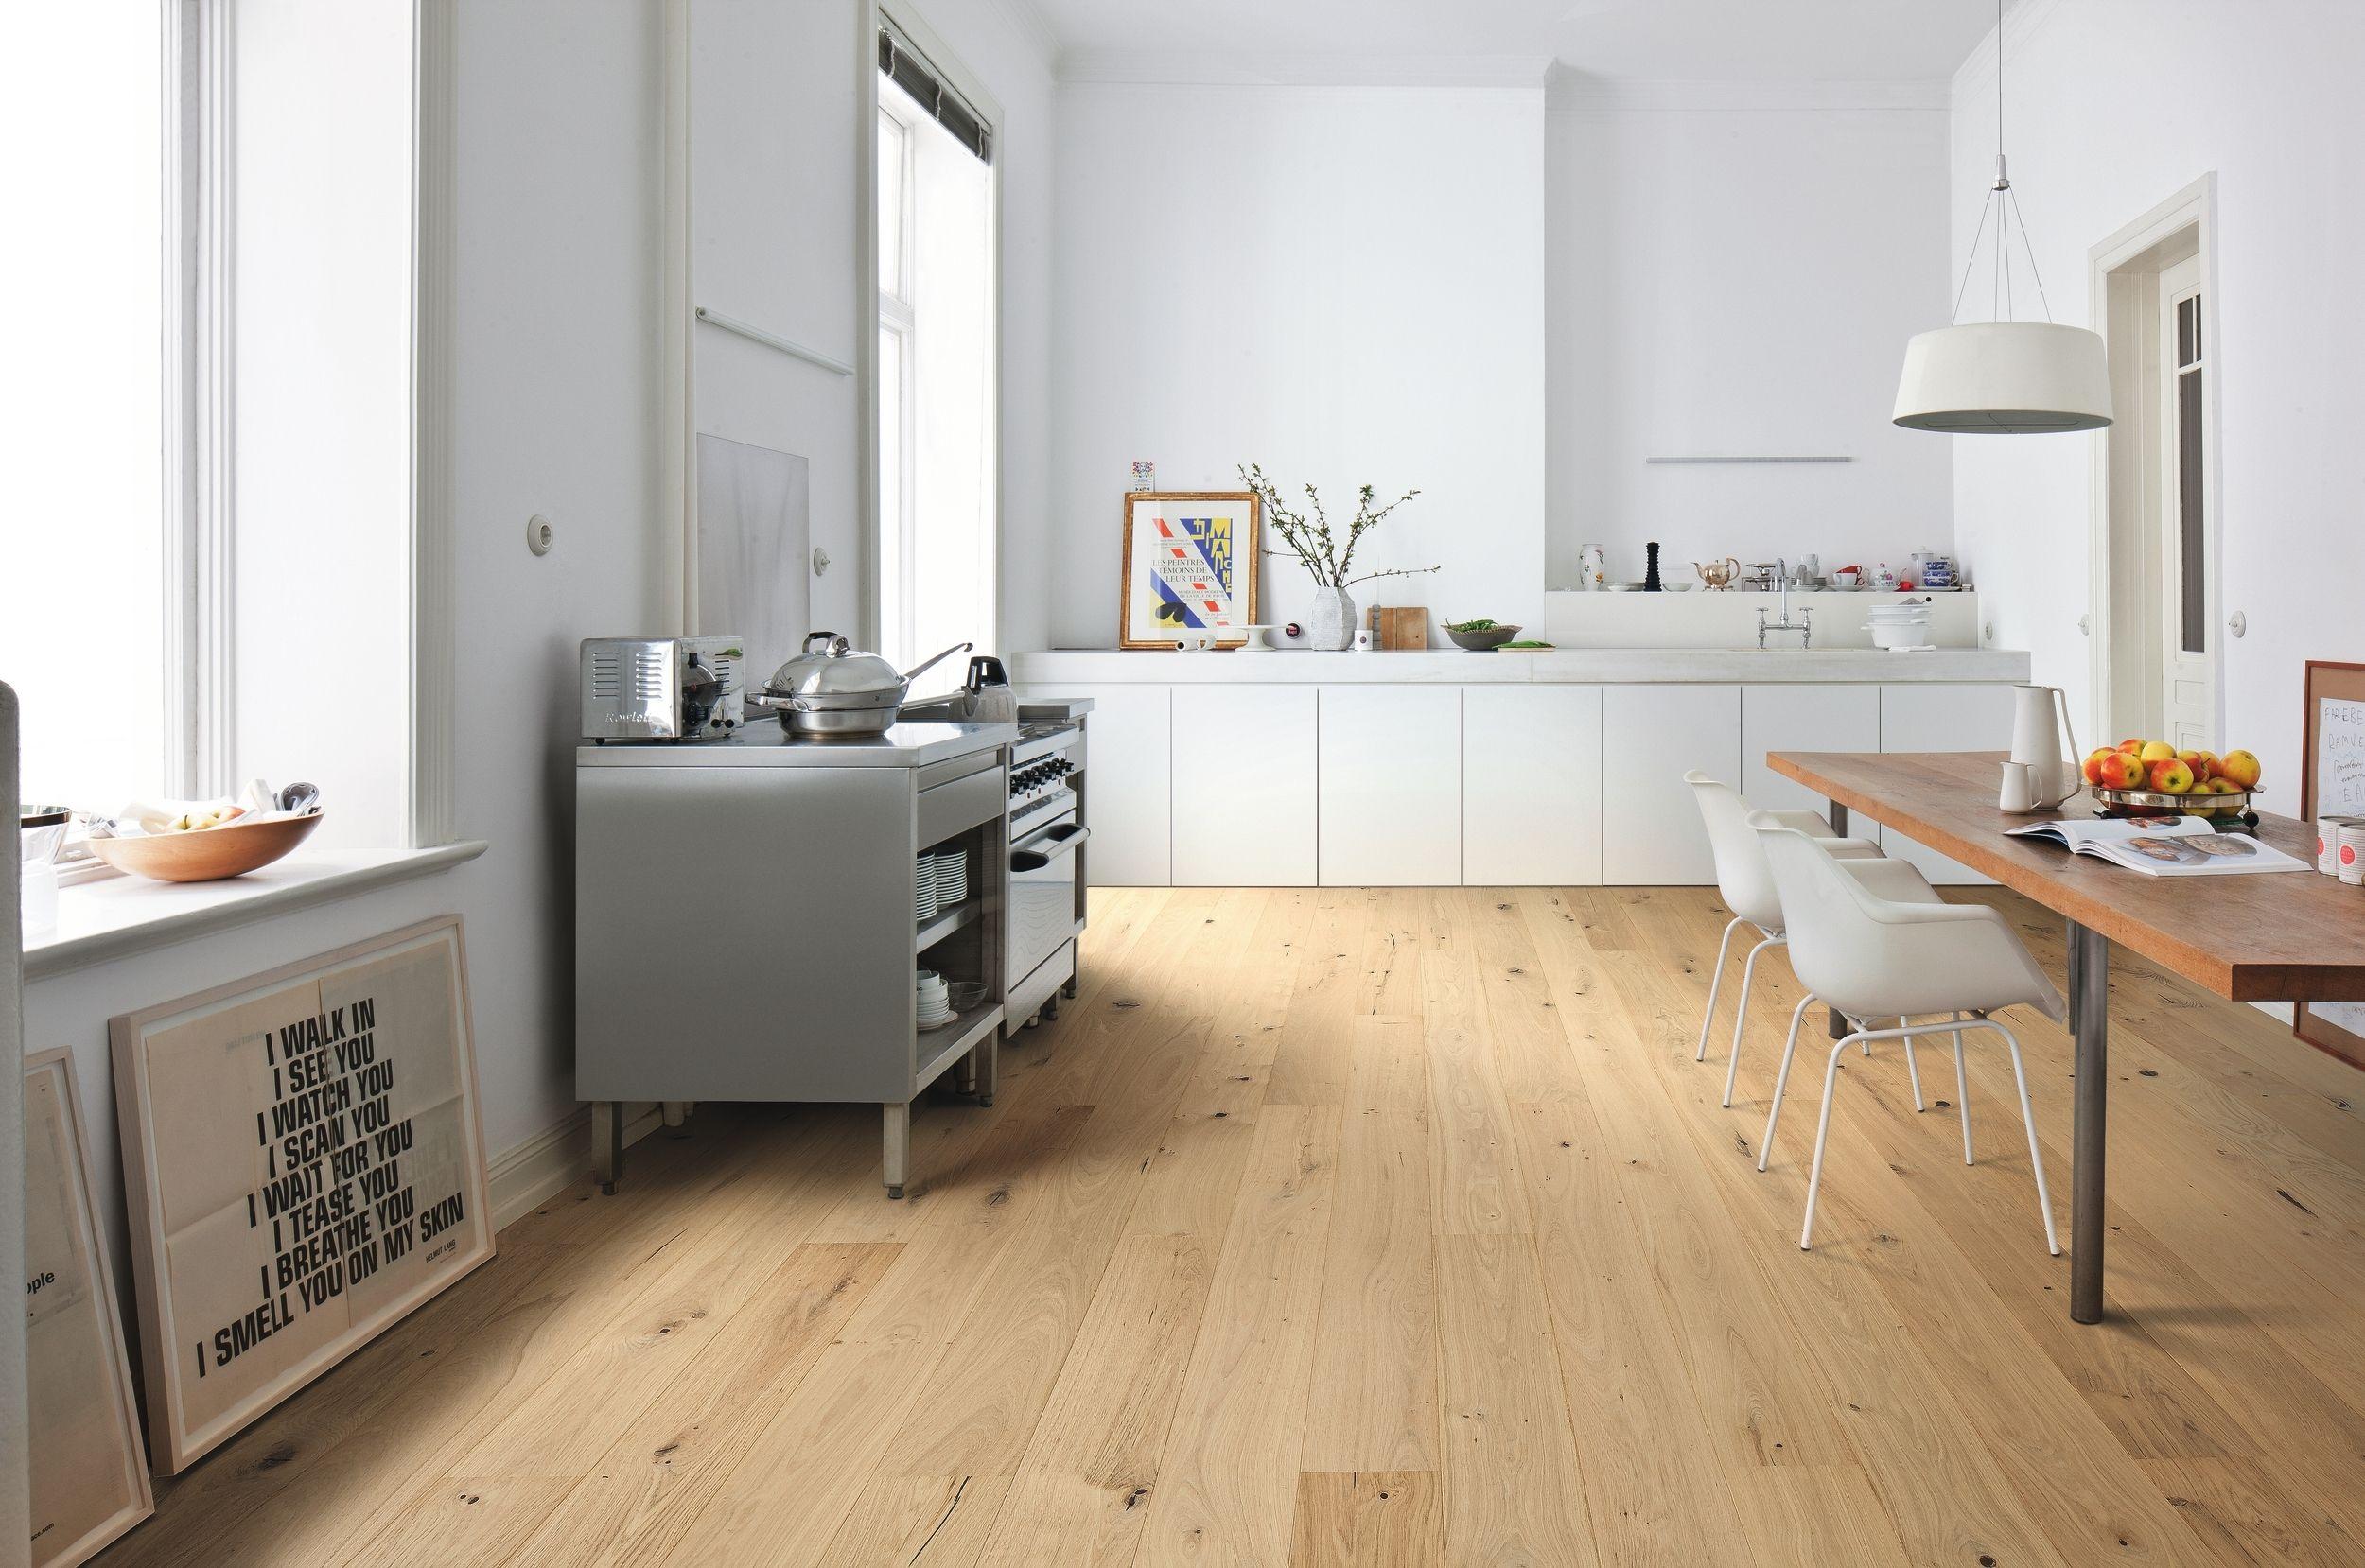 532586 haro parkett landhausdiele 4000 eiche naturel sauvage strukturiert 2v fase uv ge lt. Black Bedroom Furniture Sets. Home Design Ideas